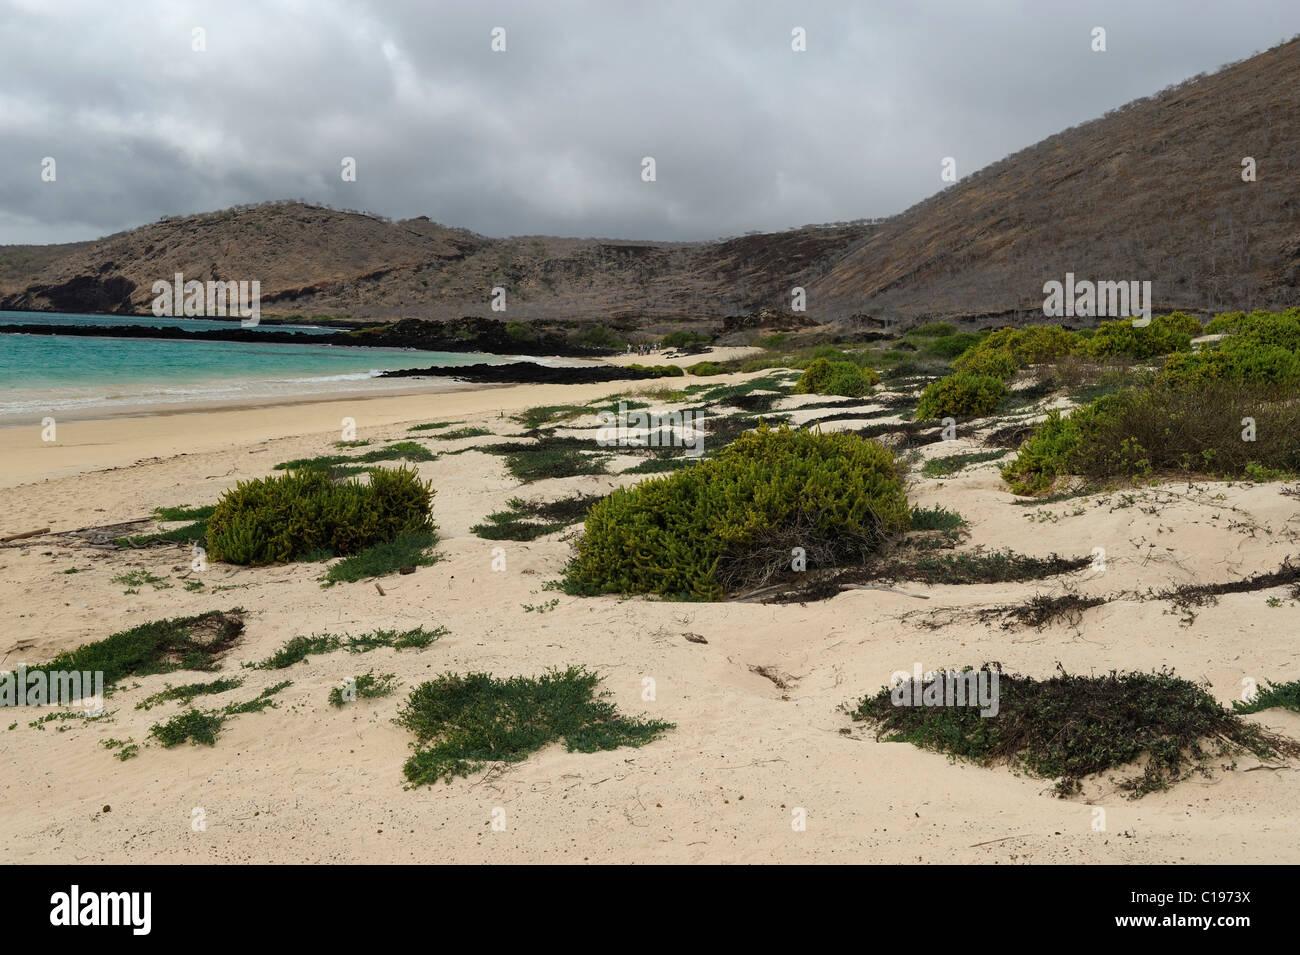 White sandy beach on the eastern side of Punta Cormoran, where Green Sea Turtles prefer to nest, Floreana Island, Stock Photo